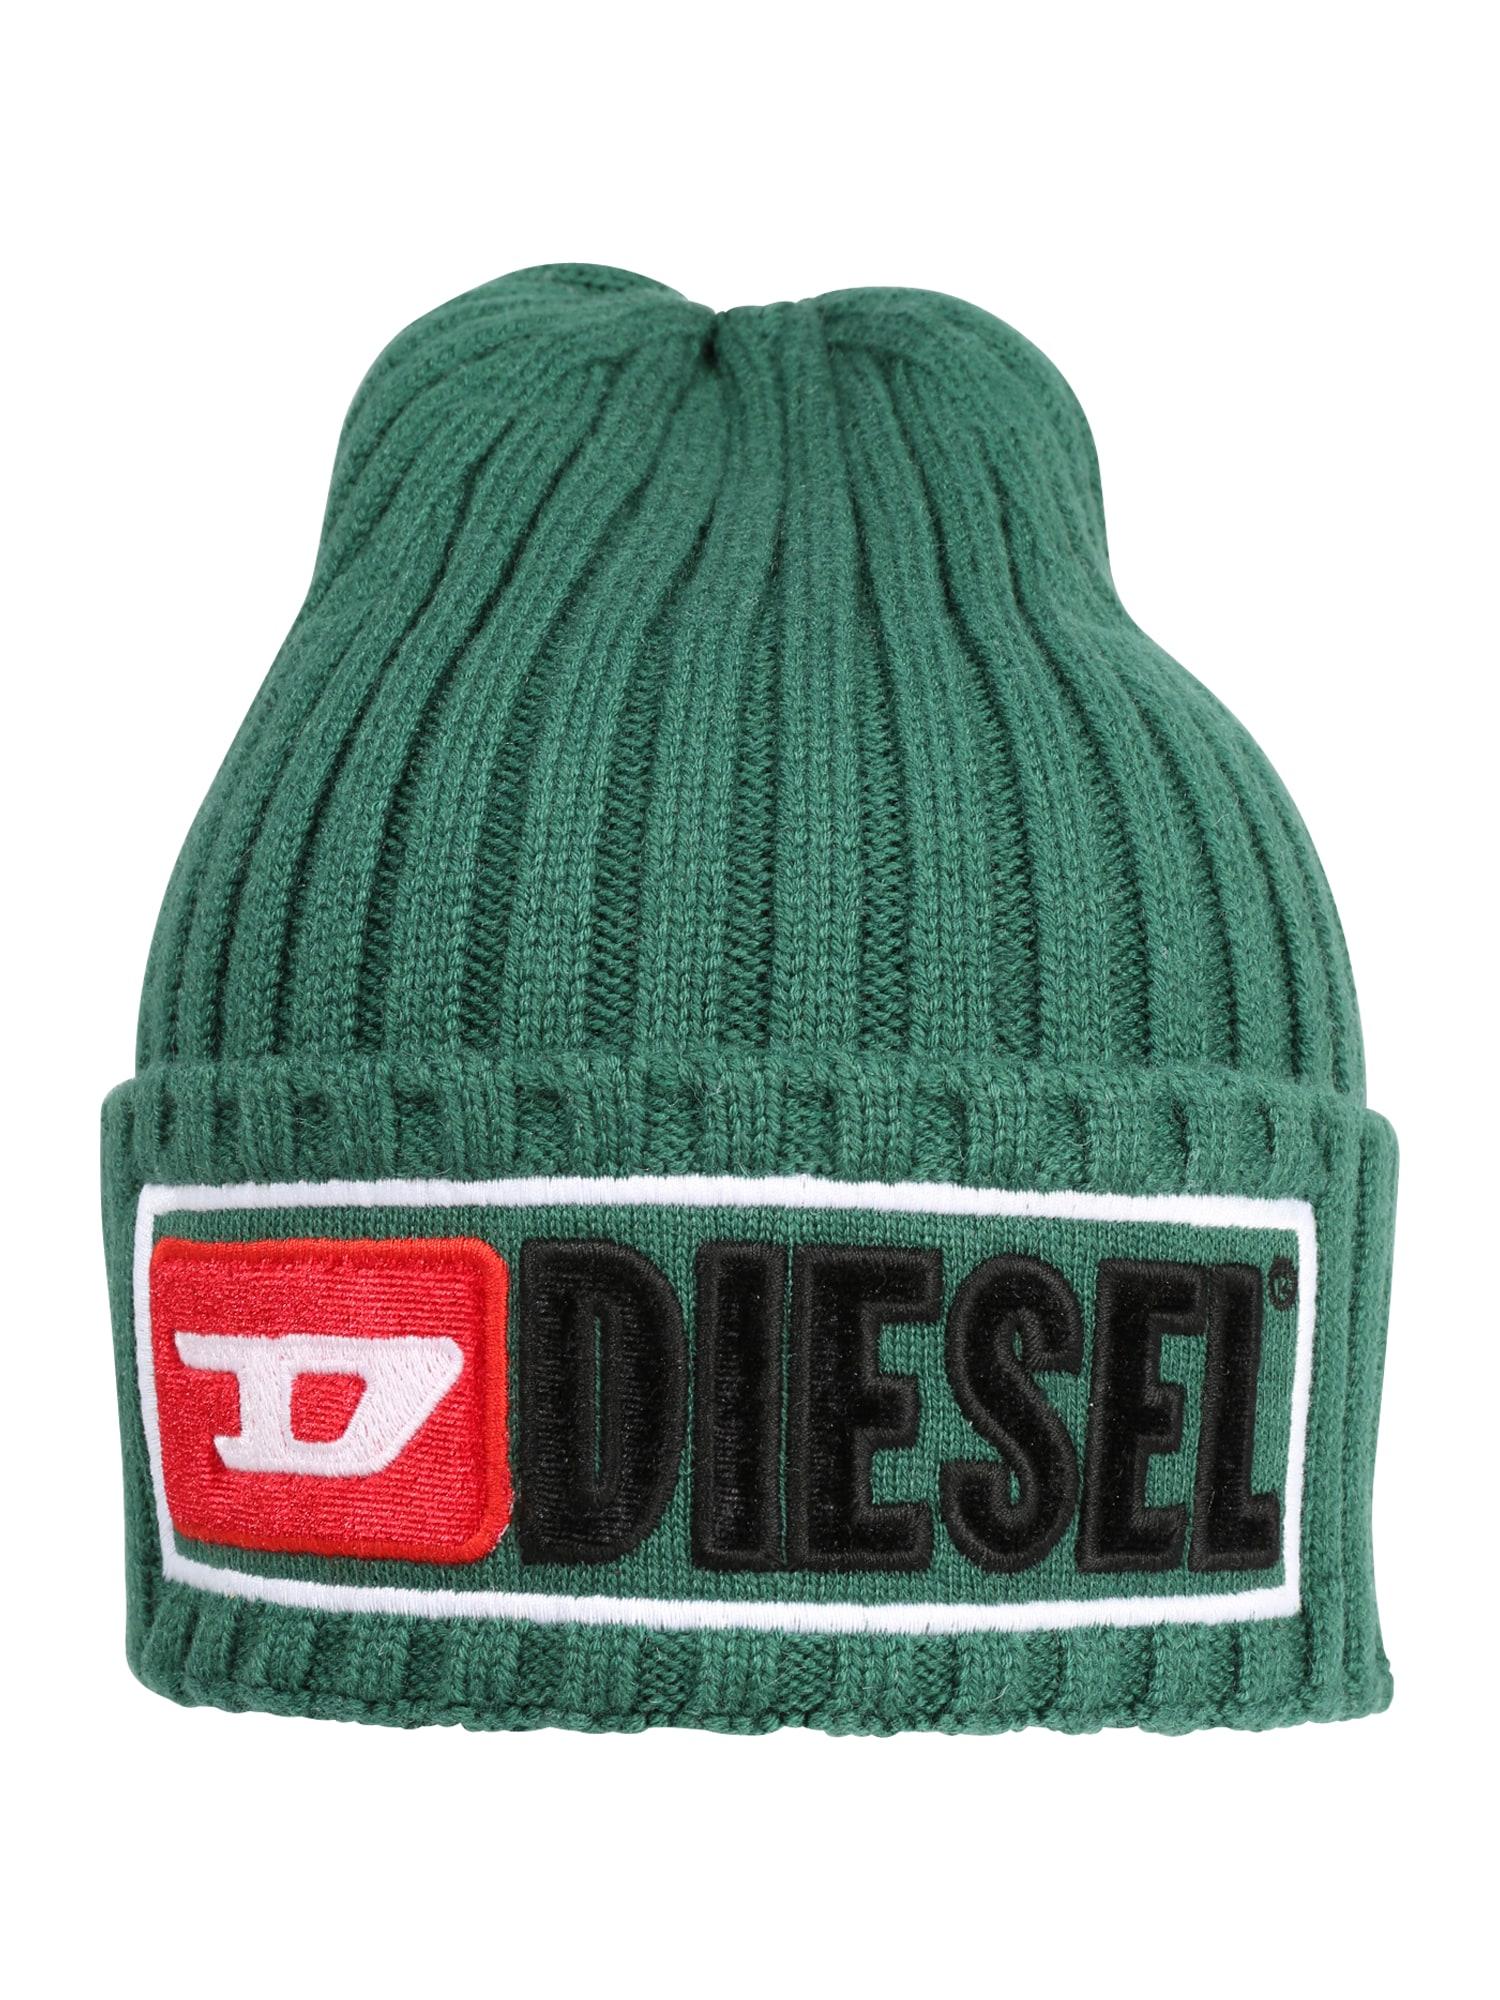 DIESEL, Heren Muts 'CODER', groen